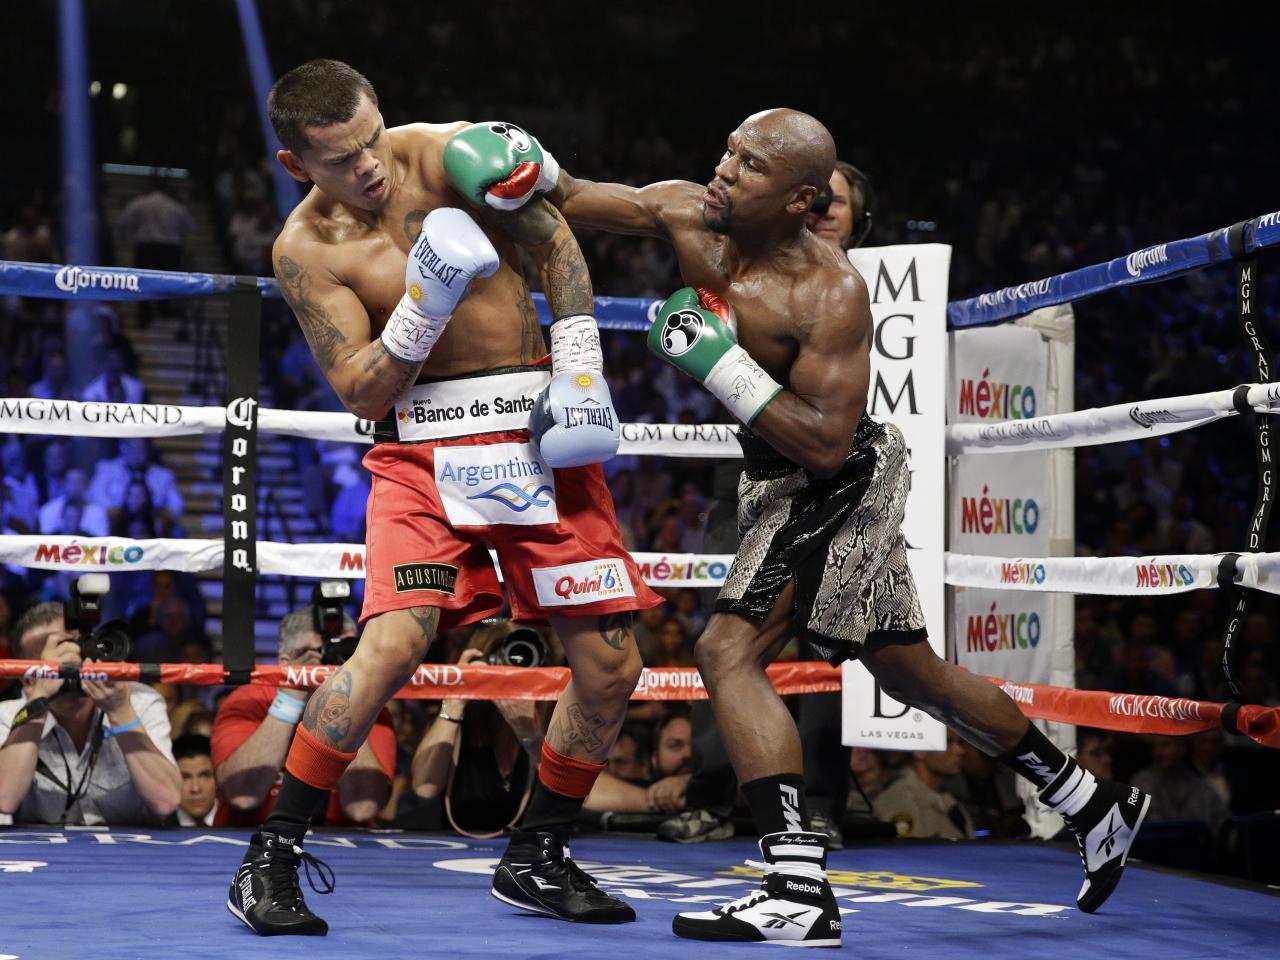 Floyd Mayweather peleando - 1280x960